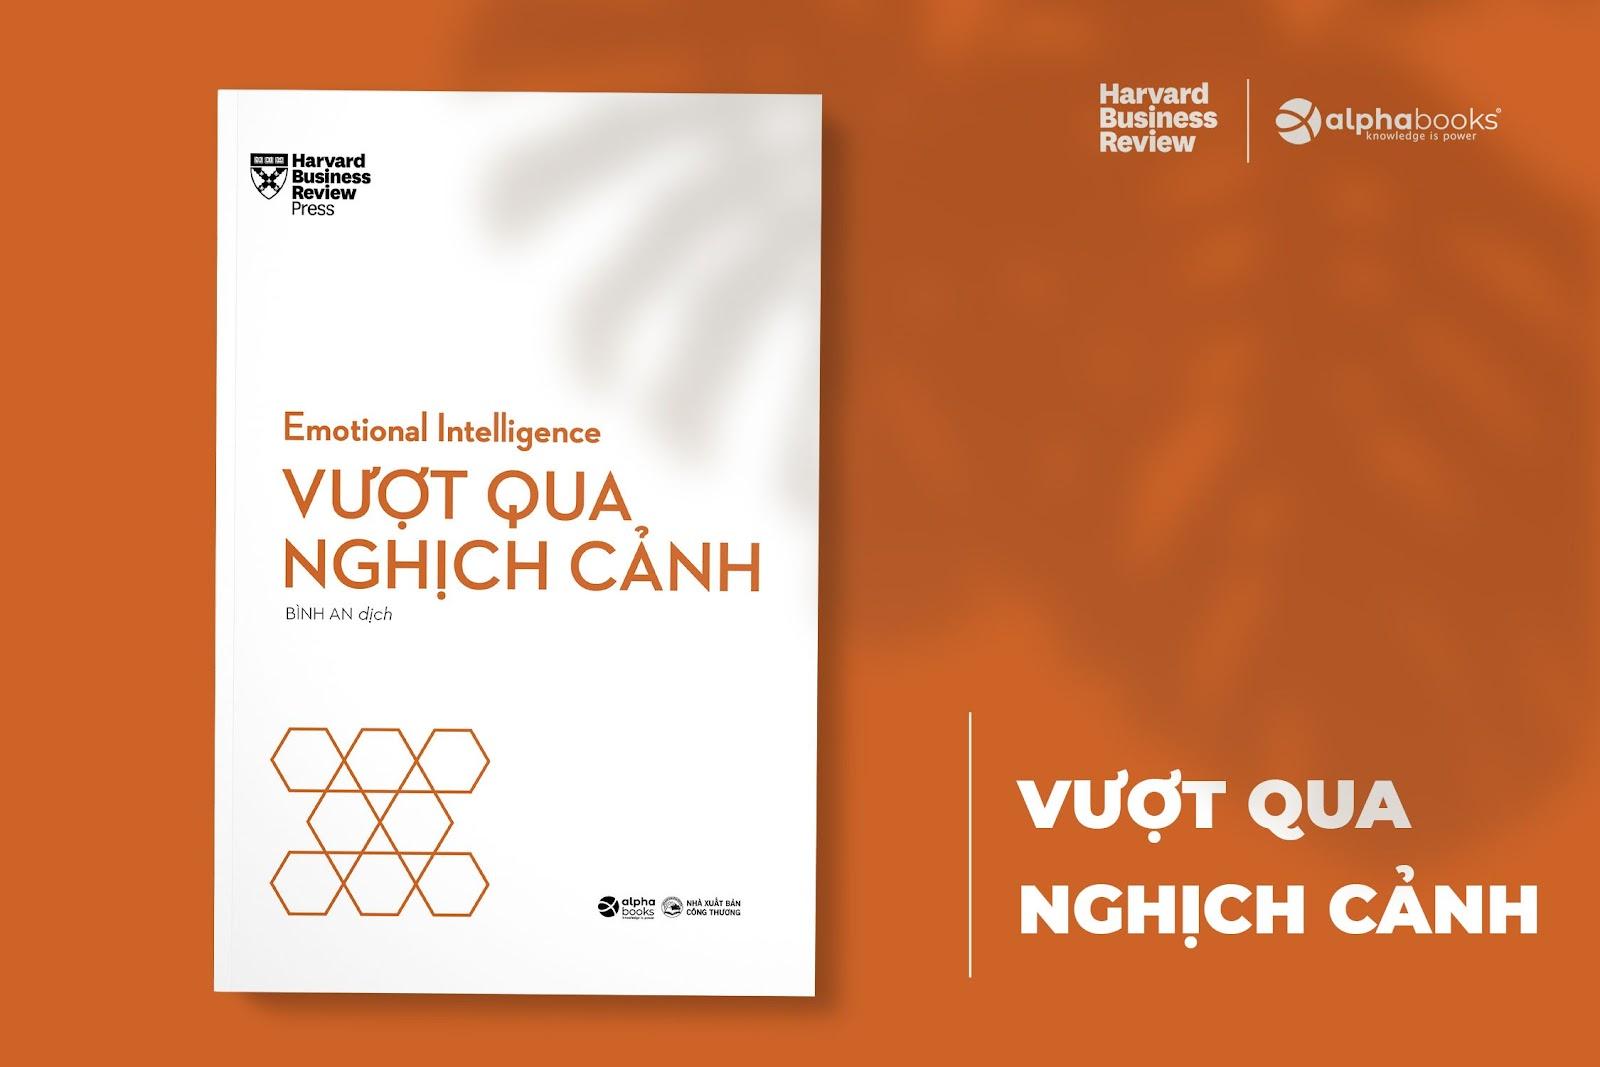 Boxset_HBR_Emotion_Intelligence__Bo_10_cuon__(vuot_qua_nghich_canh).jpg